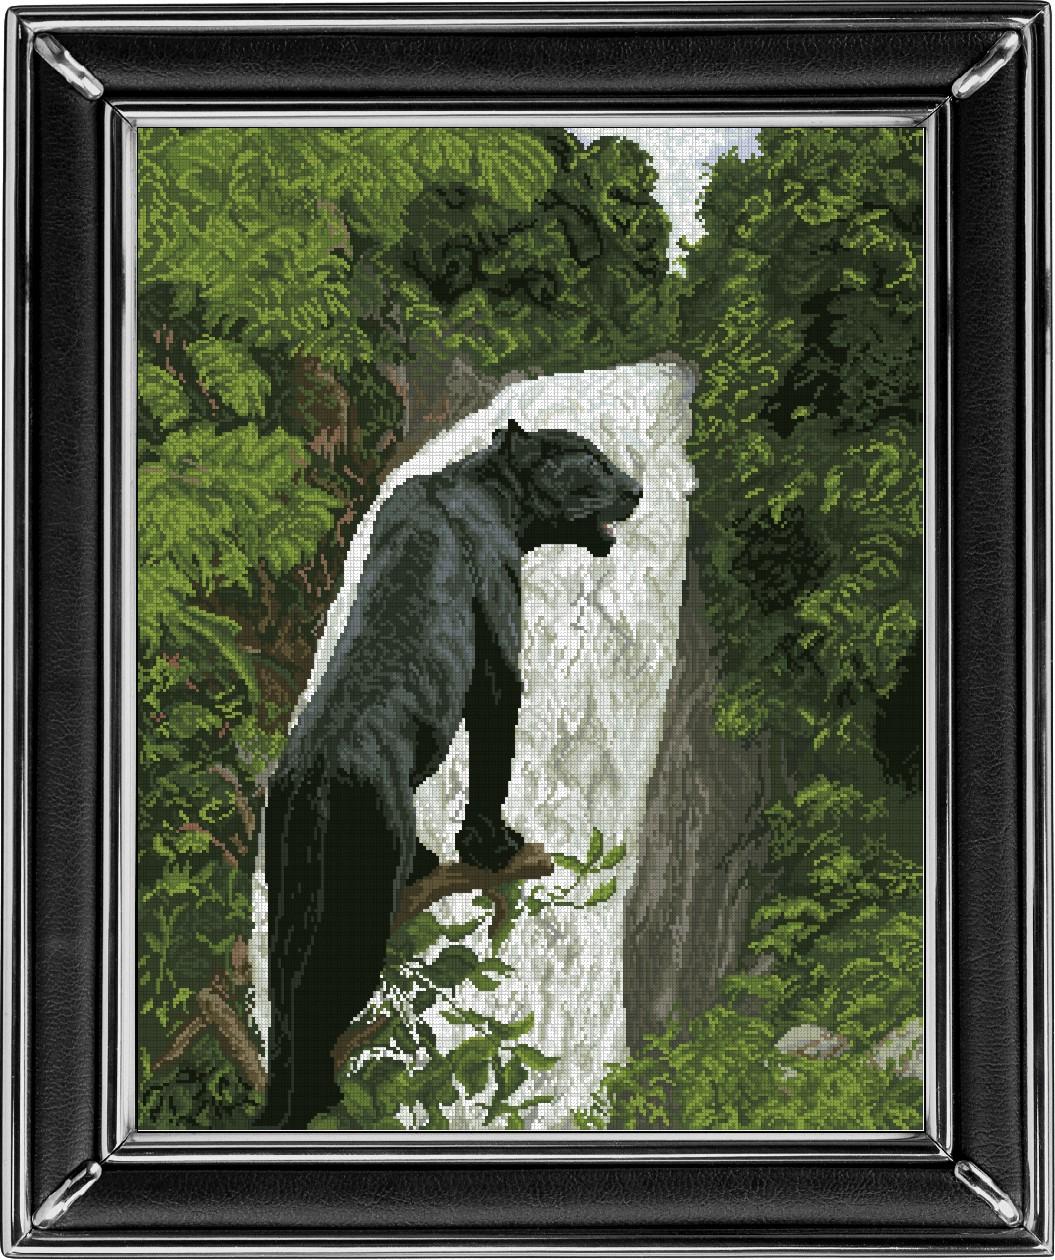 Вышивка черная пантера 16